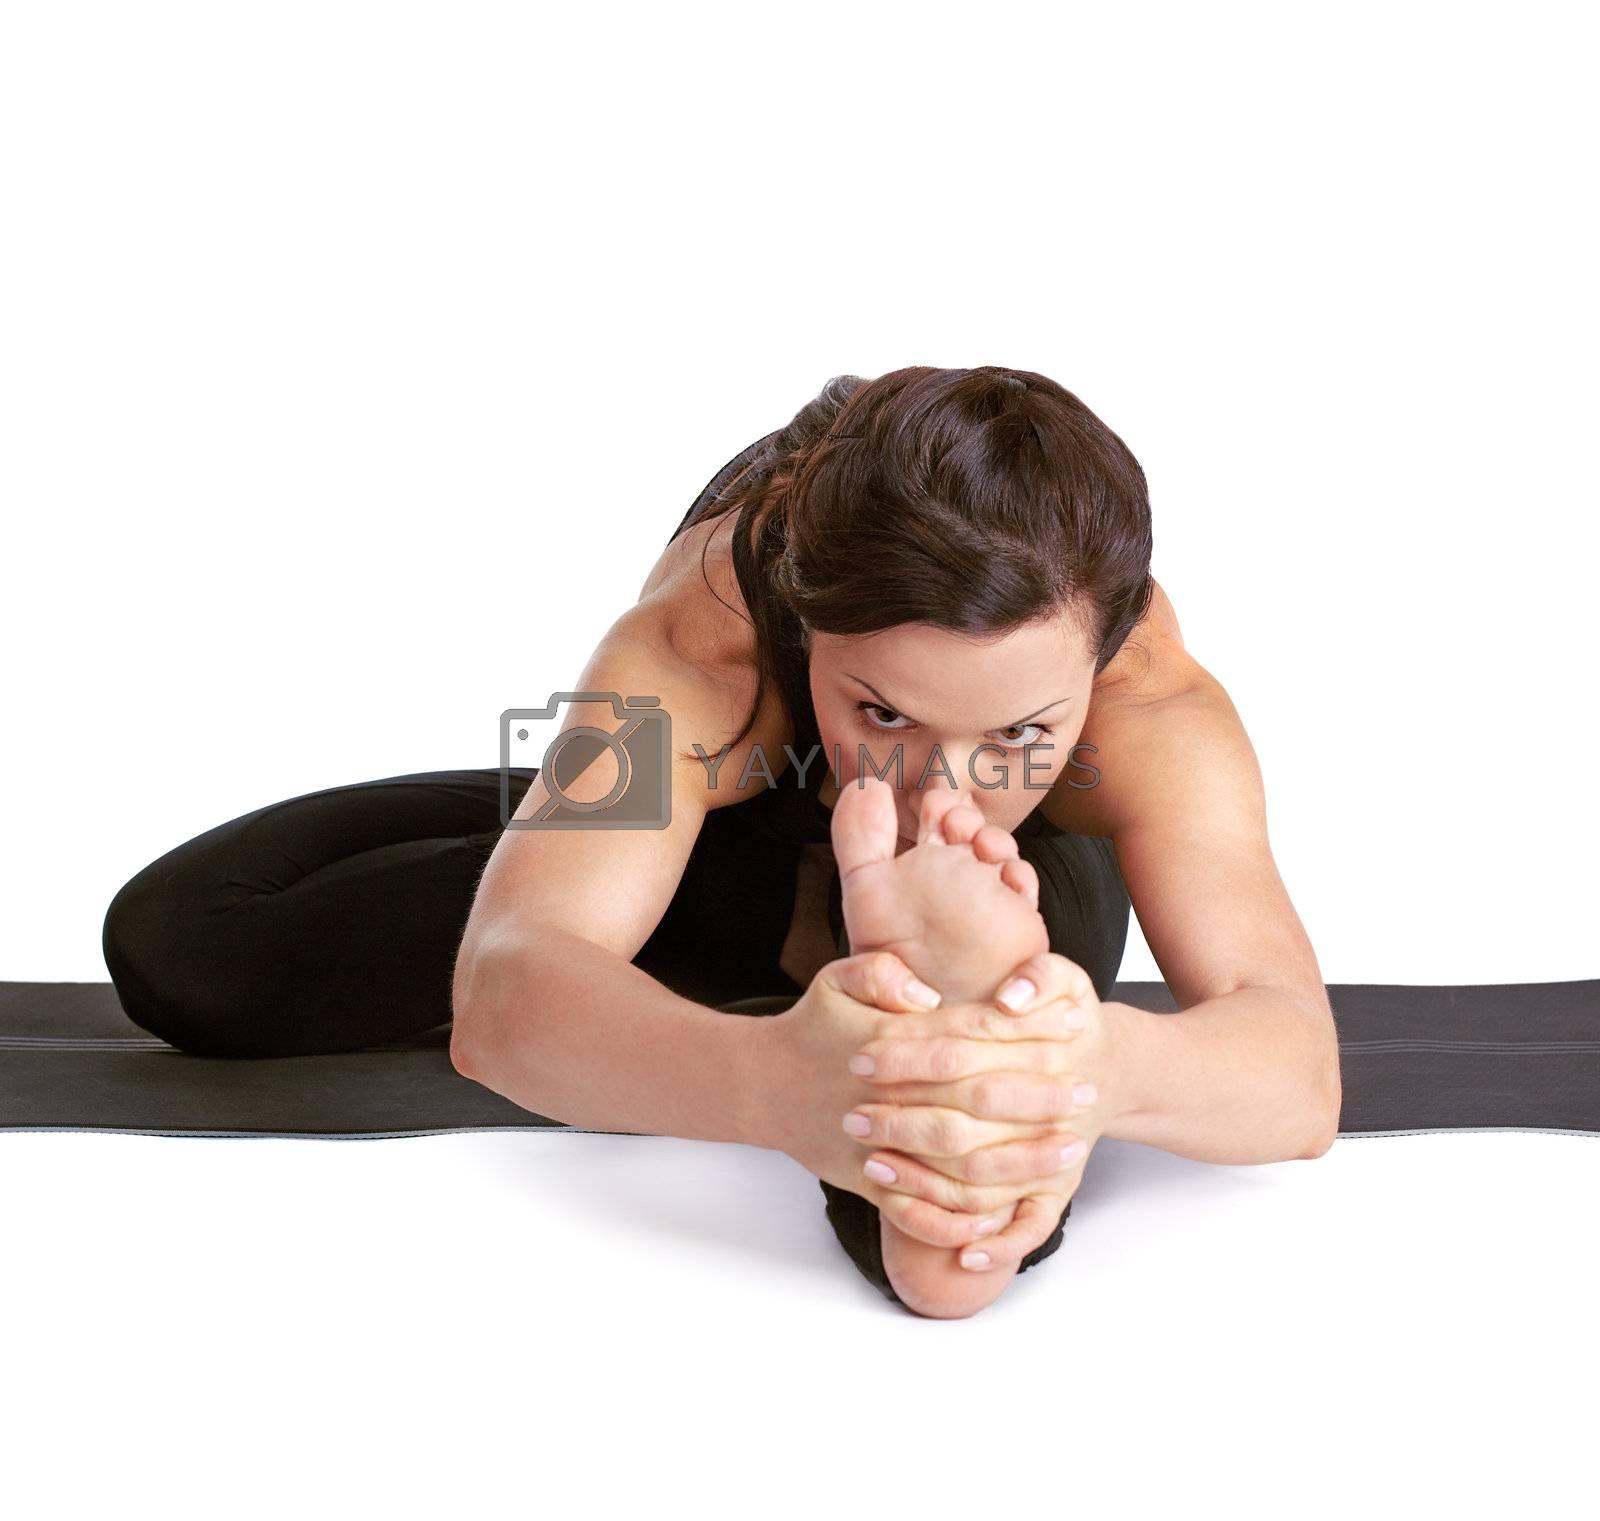 full-length portrait of beautiful woman working out yoga exercises Janu shirshasana pose on fitness mat